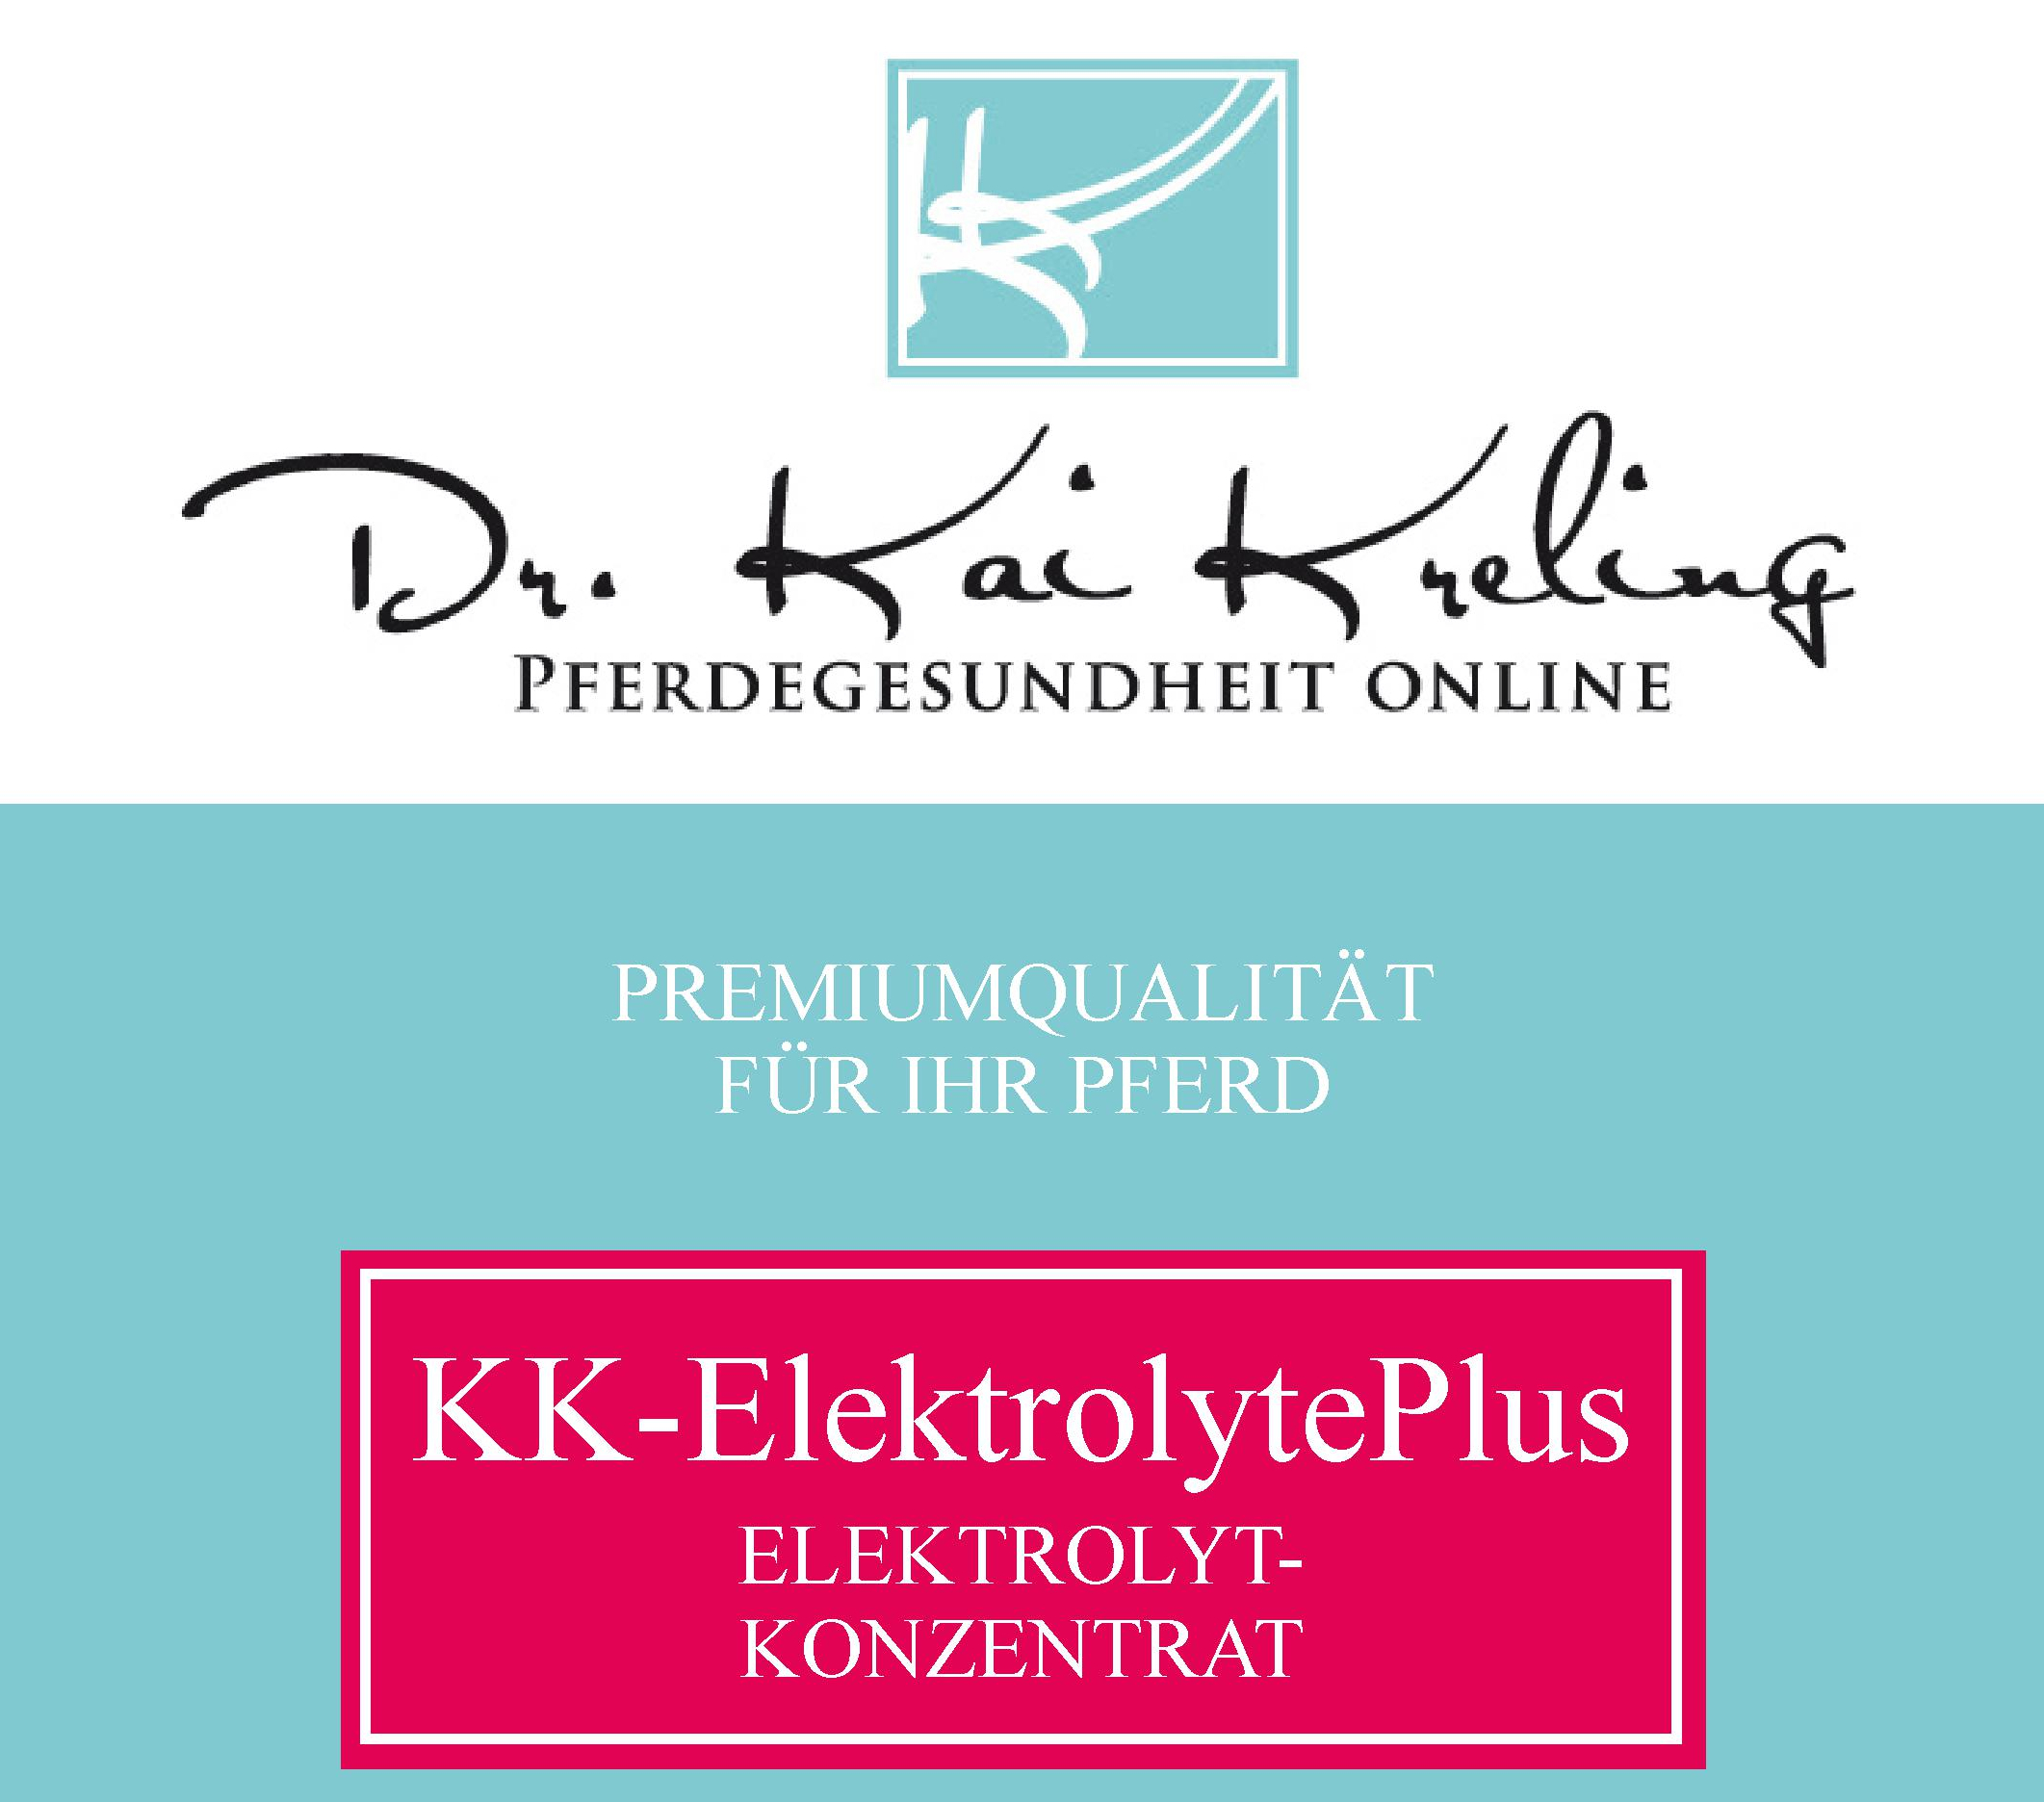 KK-ElektrolytePlus